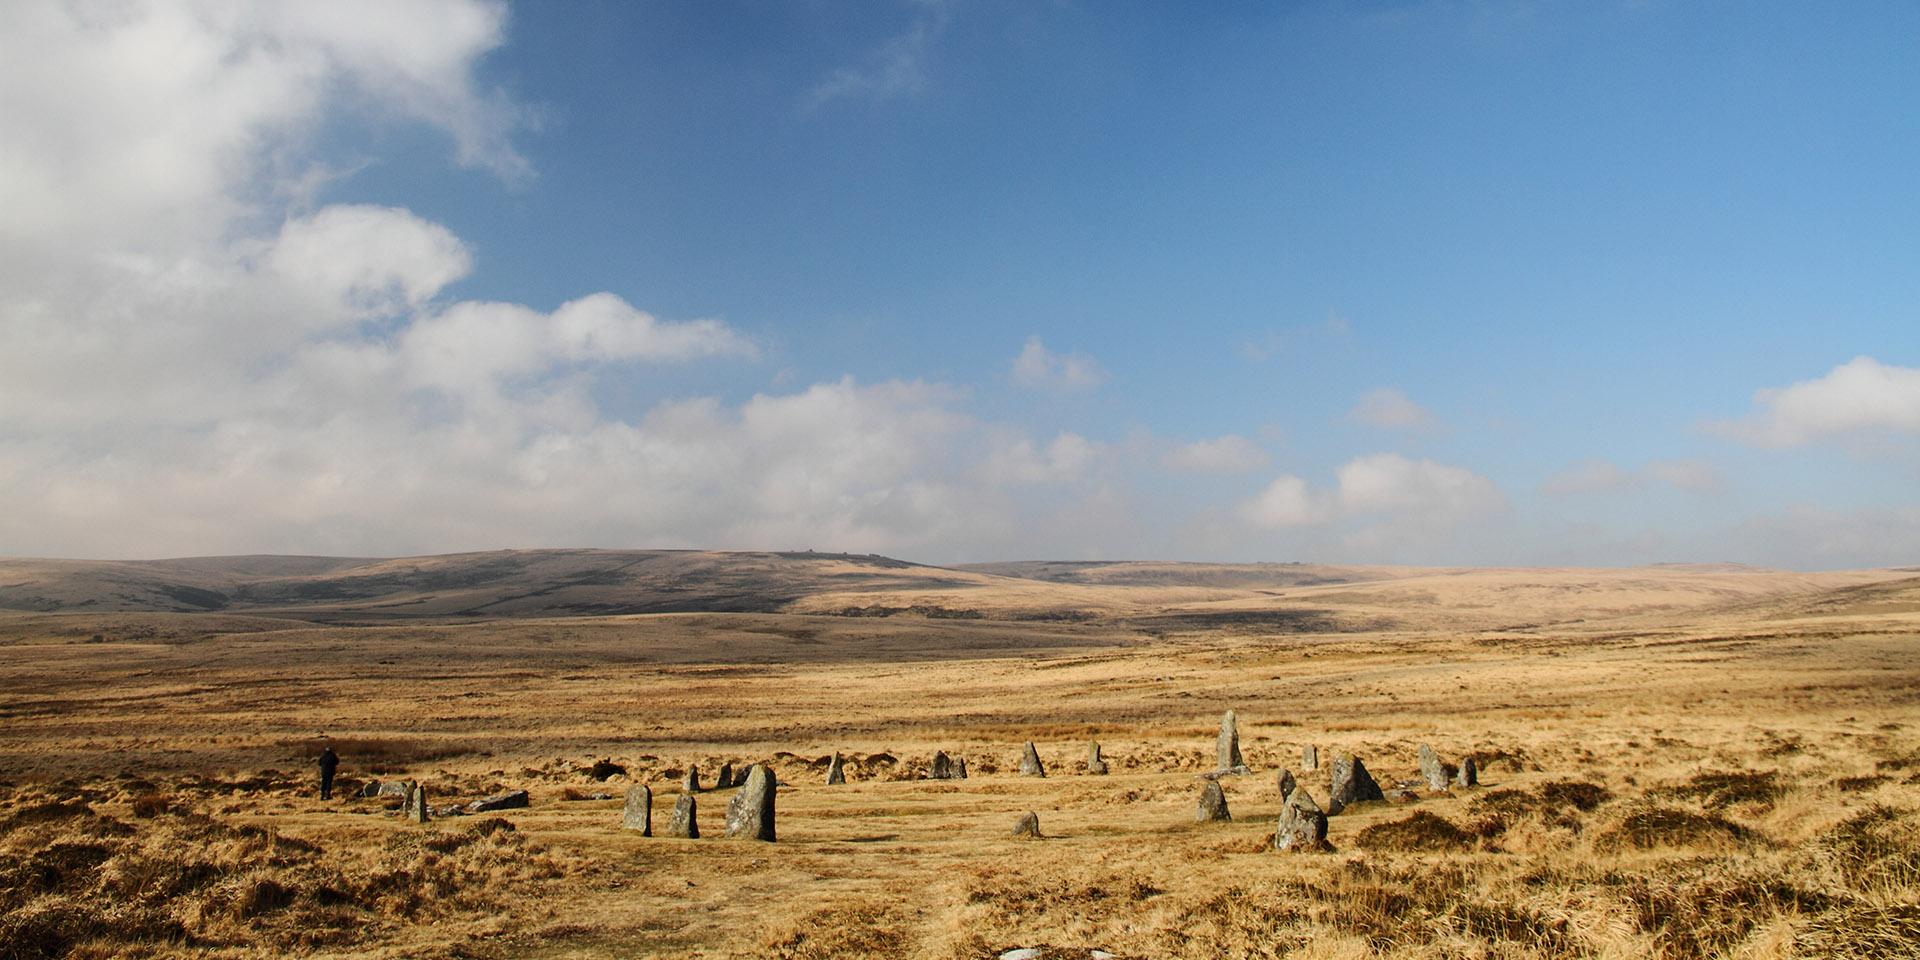 Stone circle at Scorhill